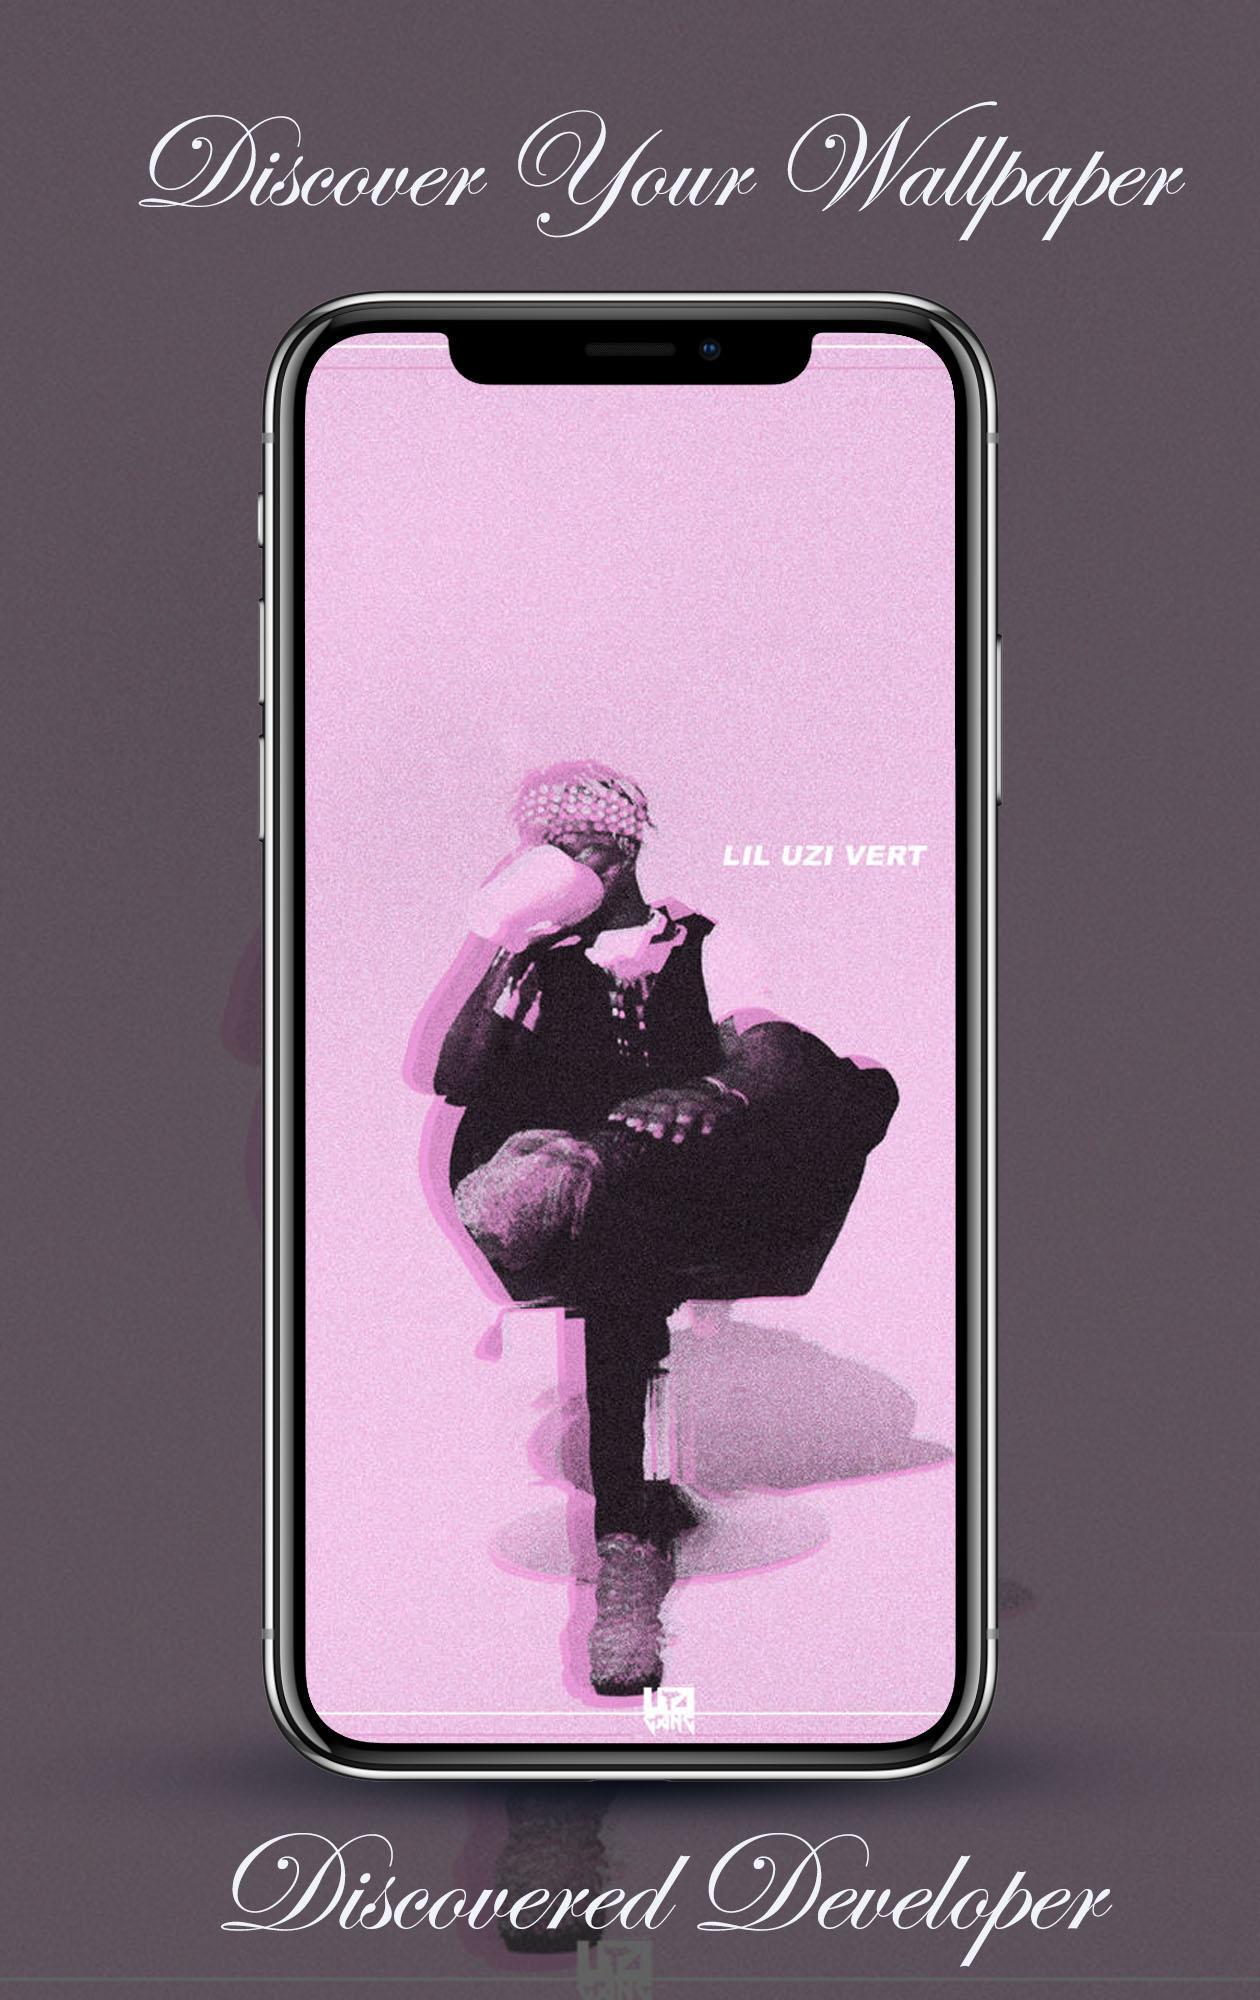 Lil Uzi Vert Wallpaper Hd 4k For Android Apk Download